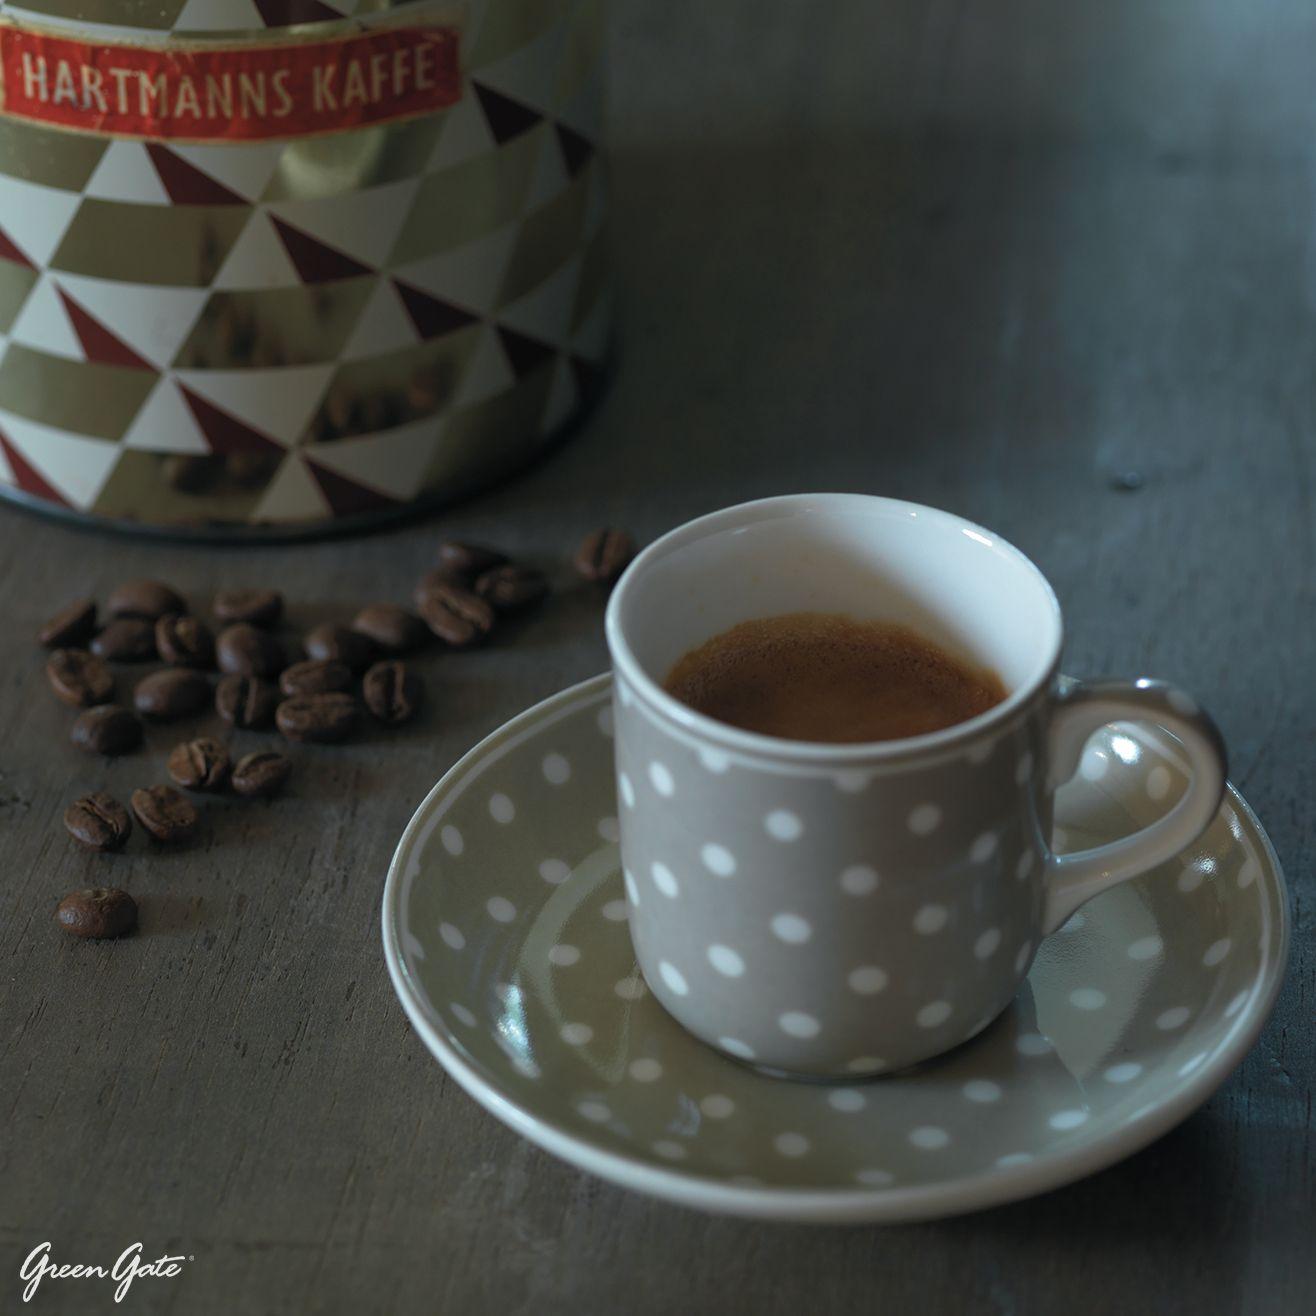 Greengate Espressotassen greengate iced liquorice coffee greengate coffee